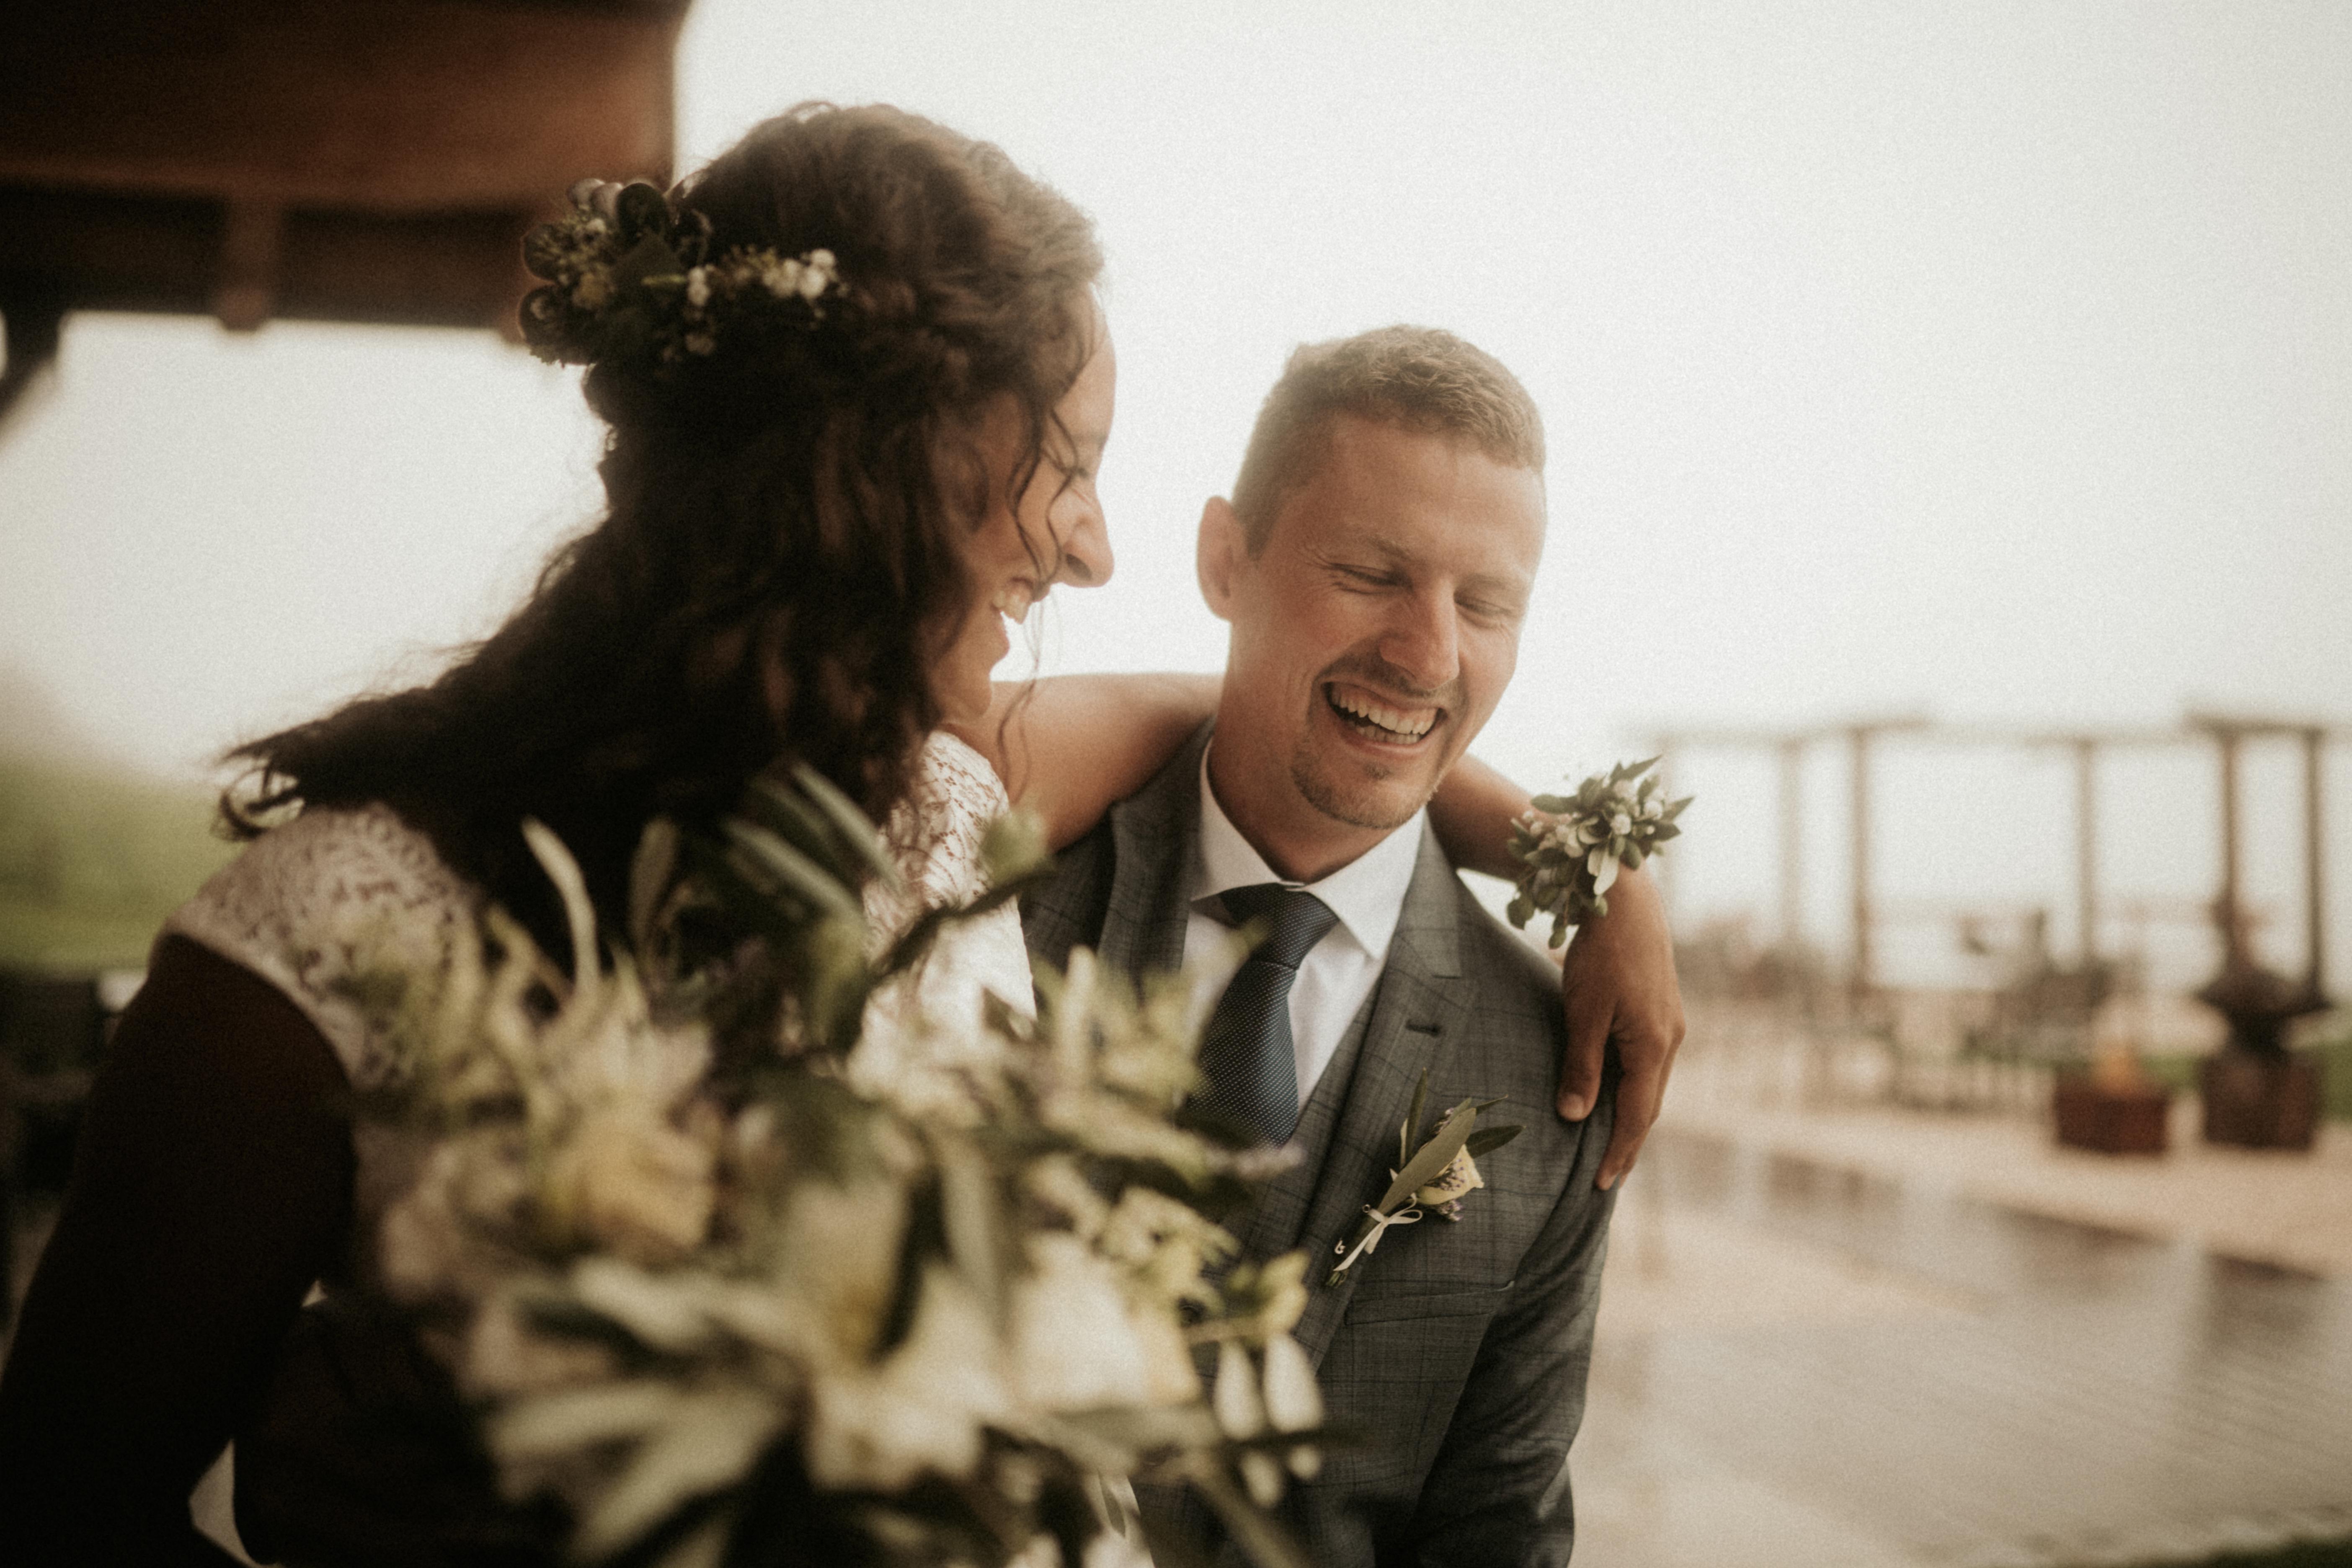 wedding_29.08.20-20